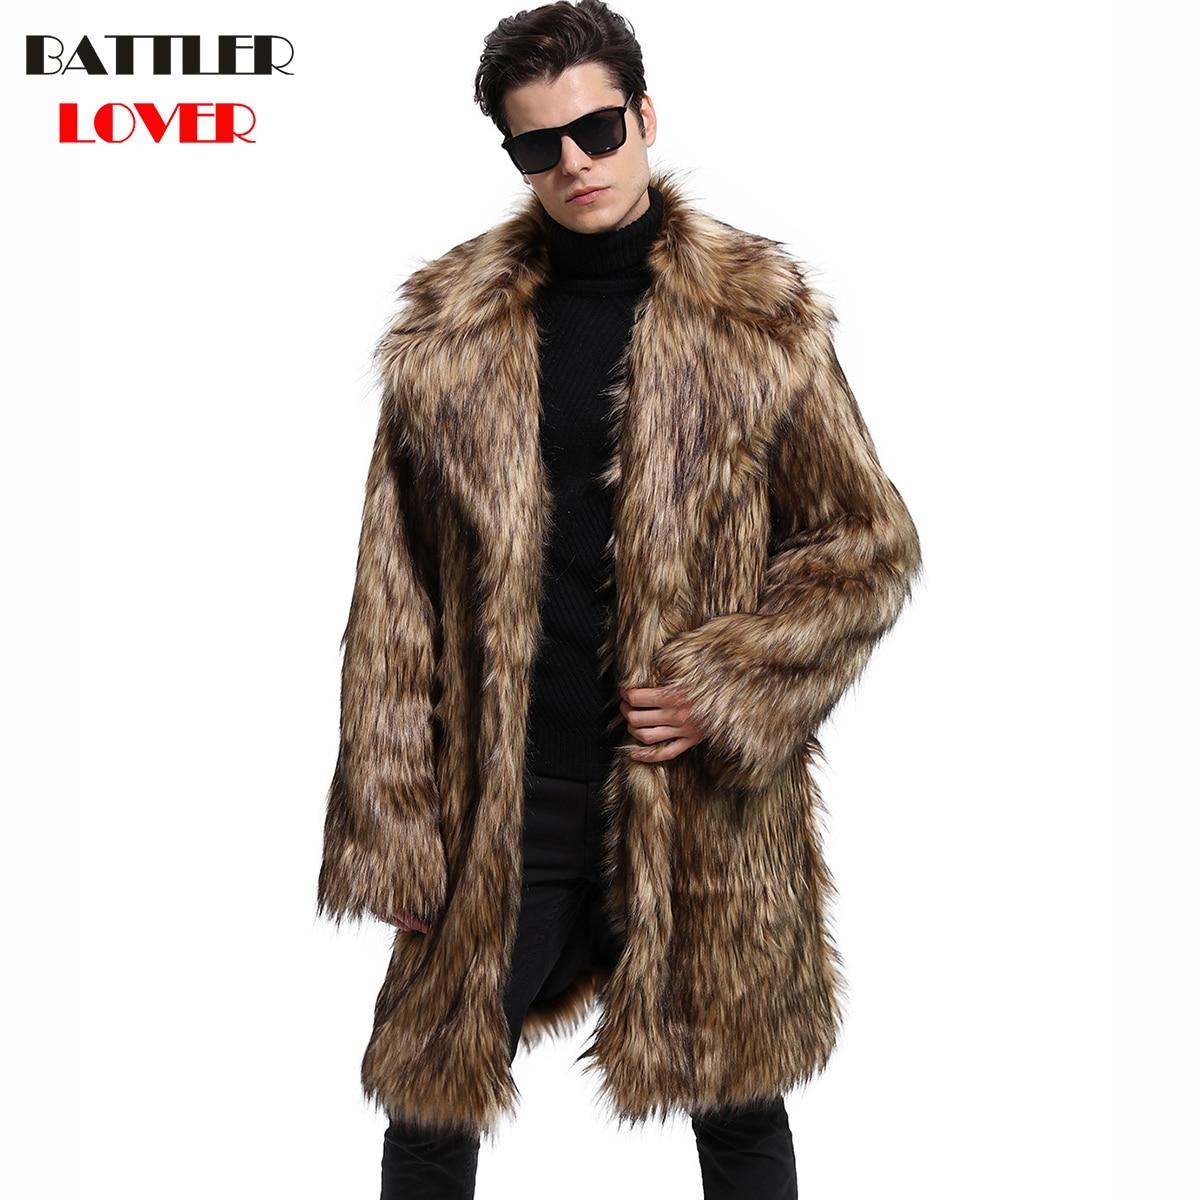 Mens Fur Coat Winter Faux Fur Thick Outwear Coats Men Punk Parka Jackets Hombre Long Leather Overcoat Genuine Fur Brand Clothing